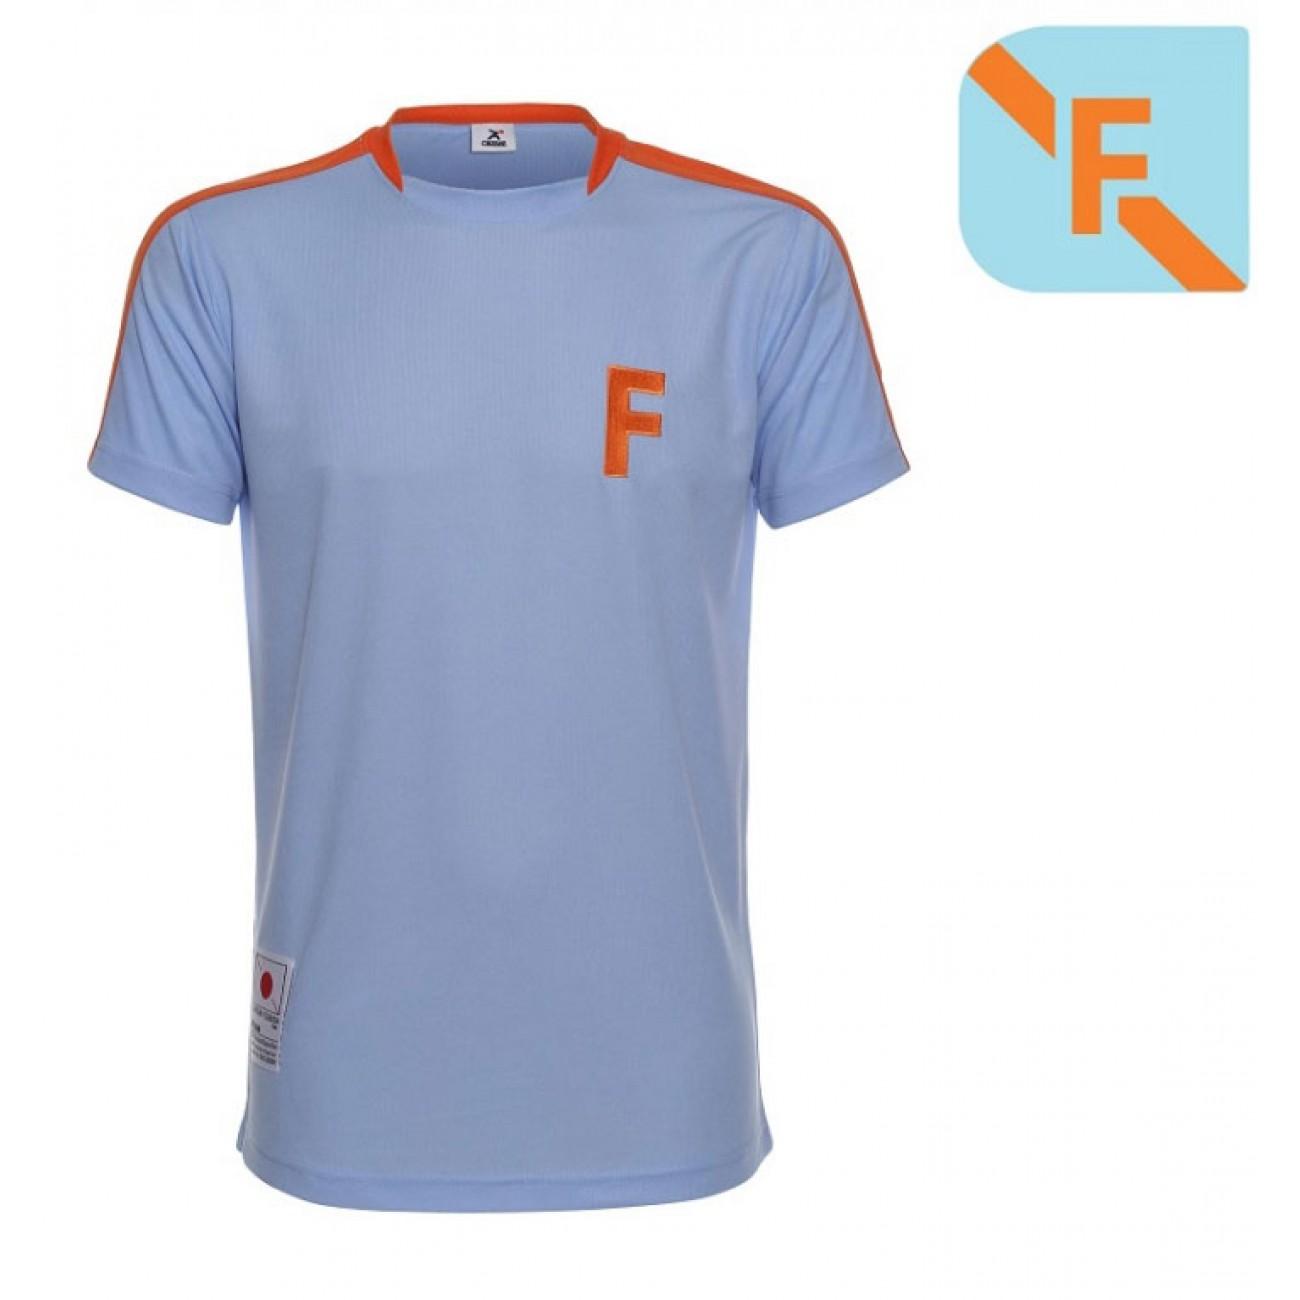 http://www.retrofootball.es/ropa-de-futbol/camiseta-flynet.html